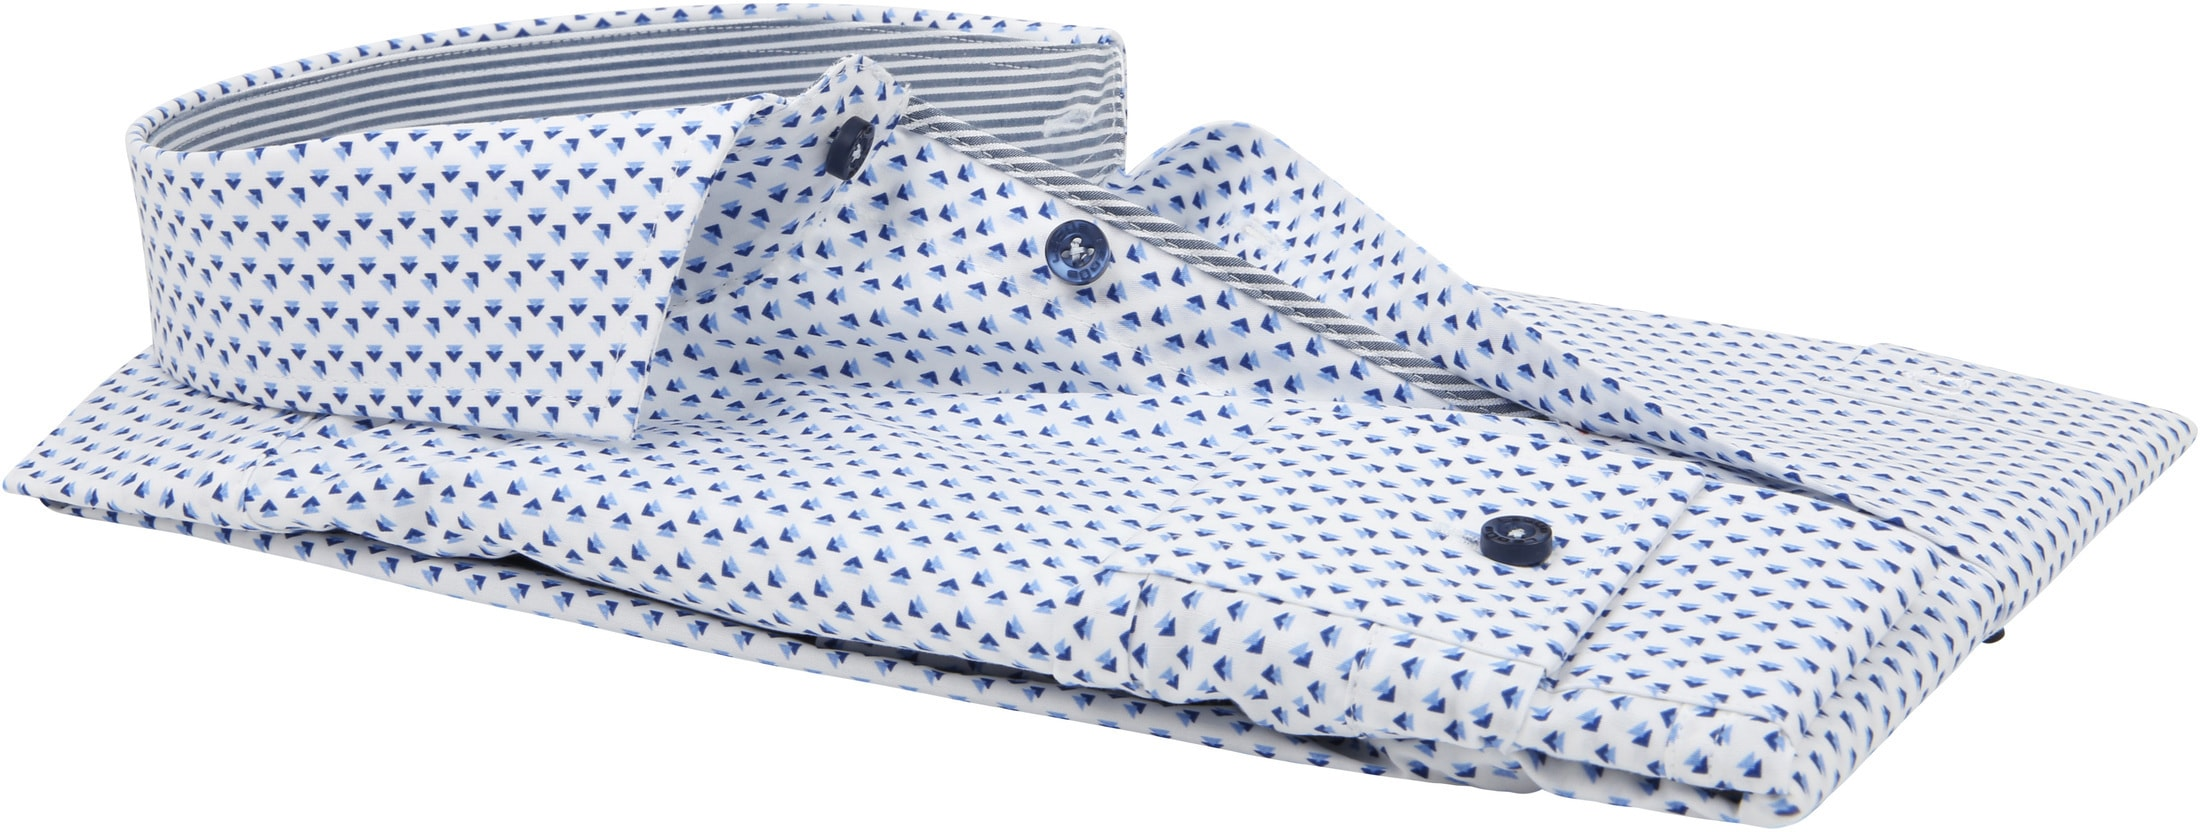 Ledub Overhemd Patroon Blauw foto 3